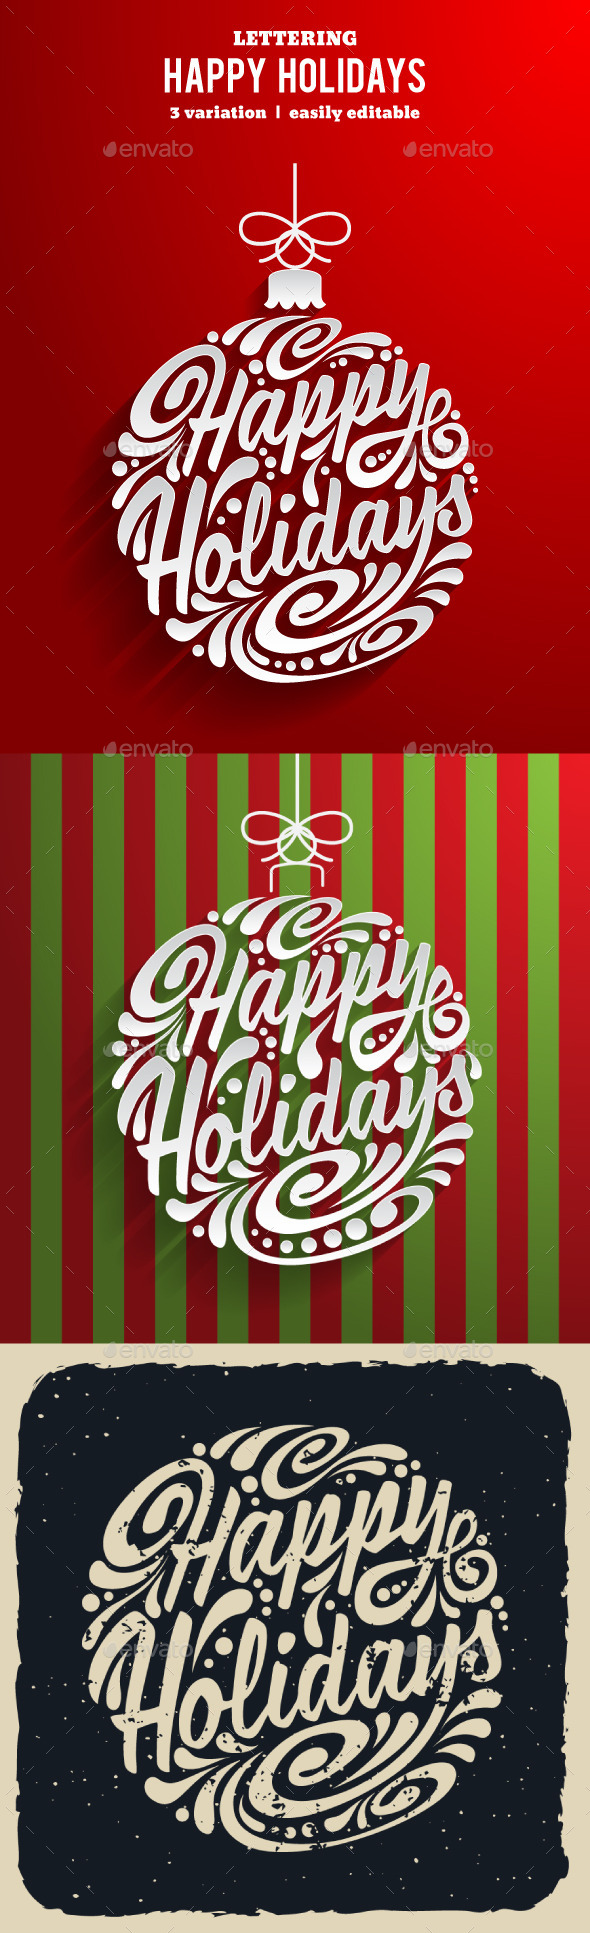 GraphicRiver Christmas Card 9771428